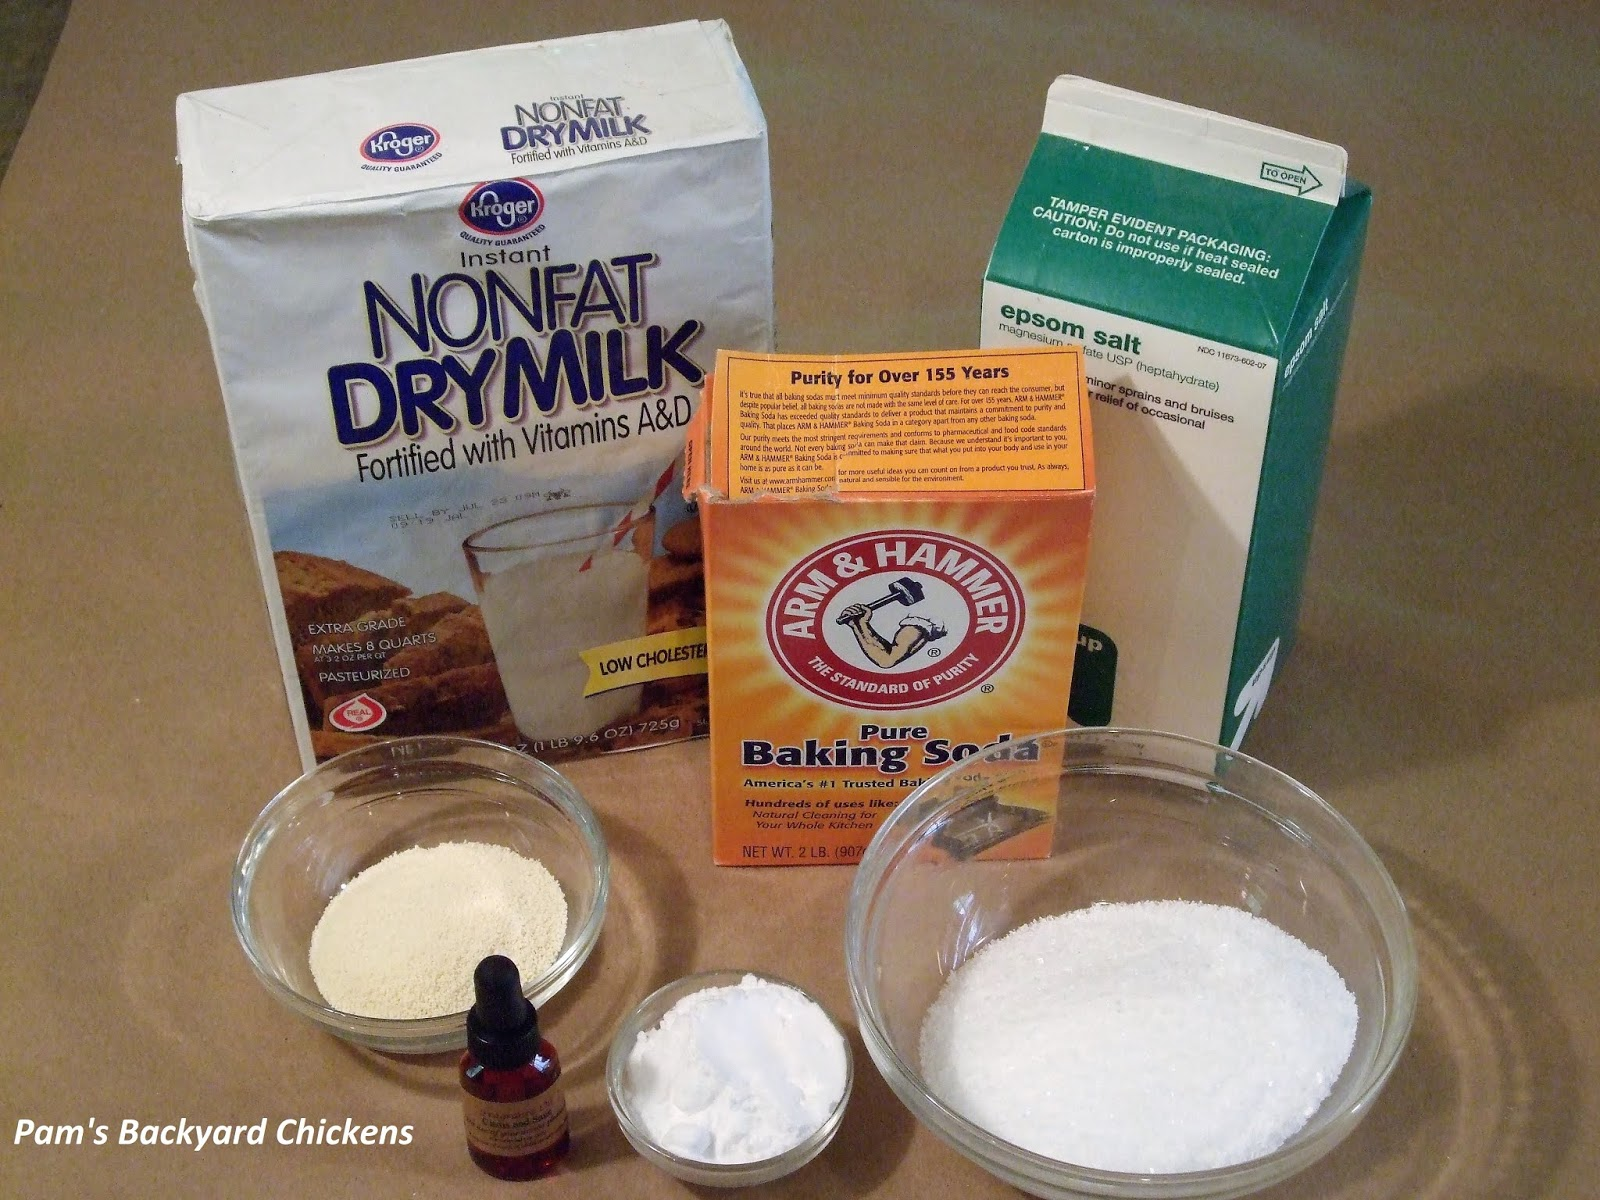 Pam's Backyard Chickens: Homemade Bath Salts and Scrubs